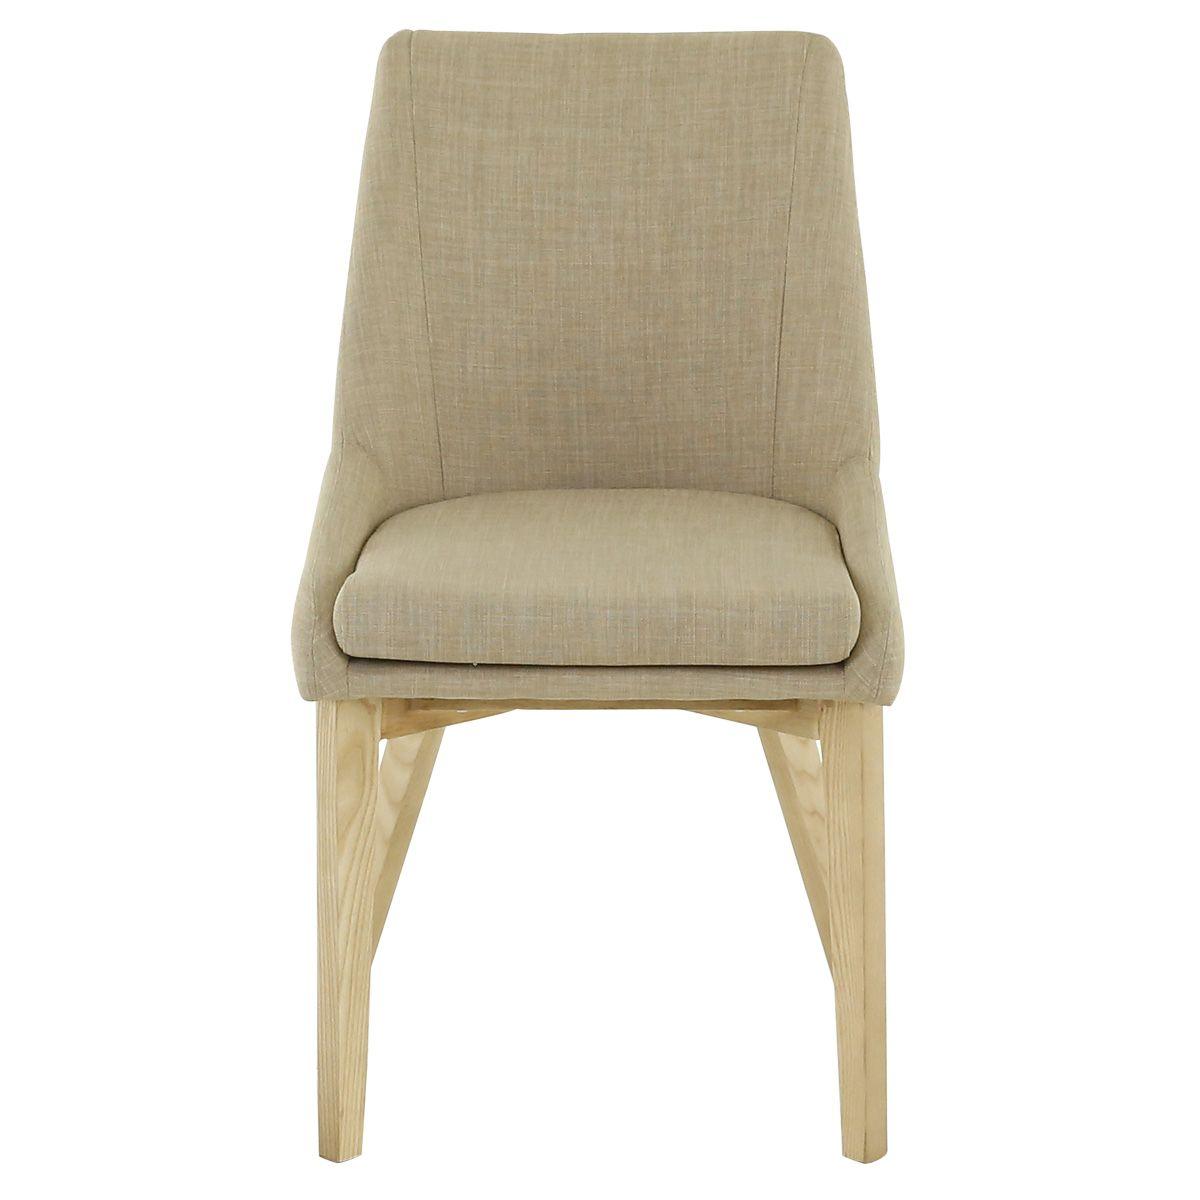 Chaise style scandinave tissu beige et bois de frêne Pistil